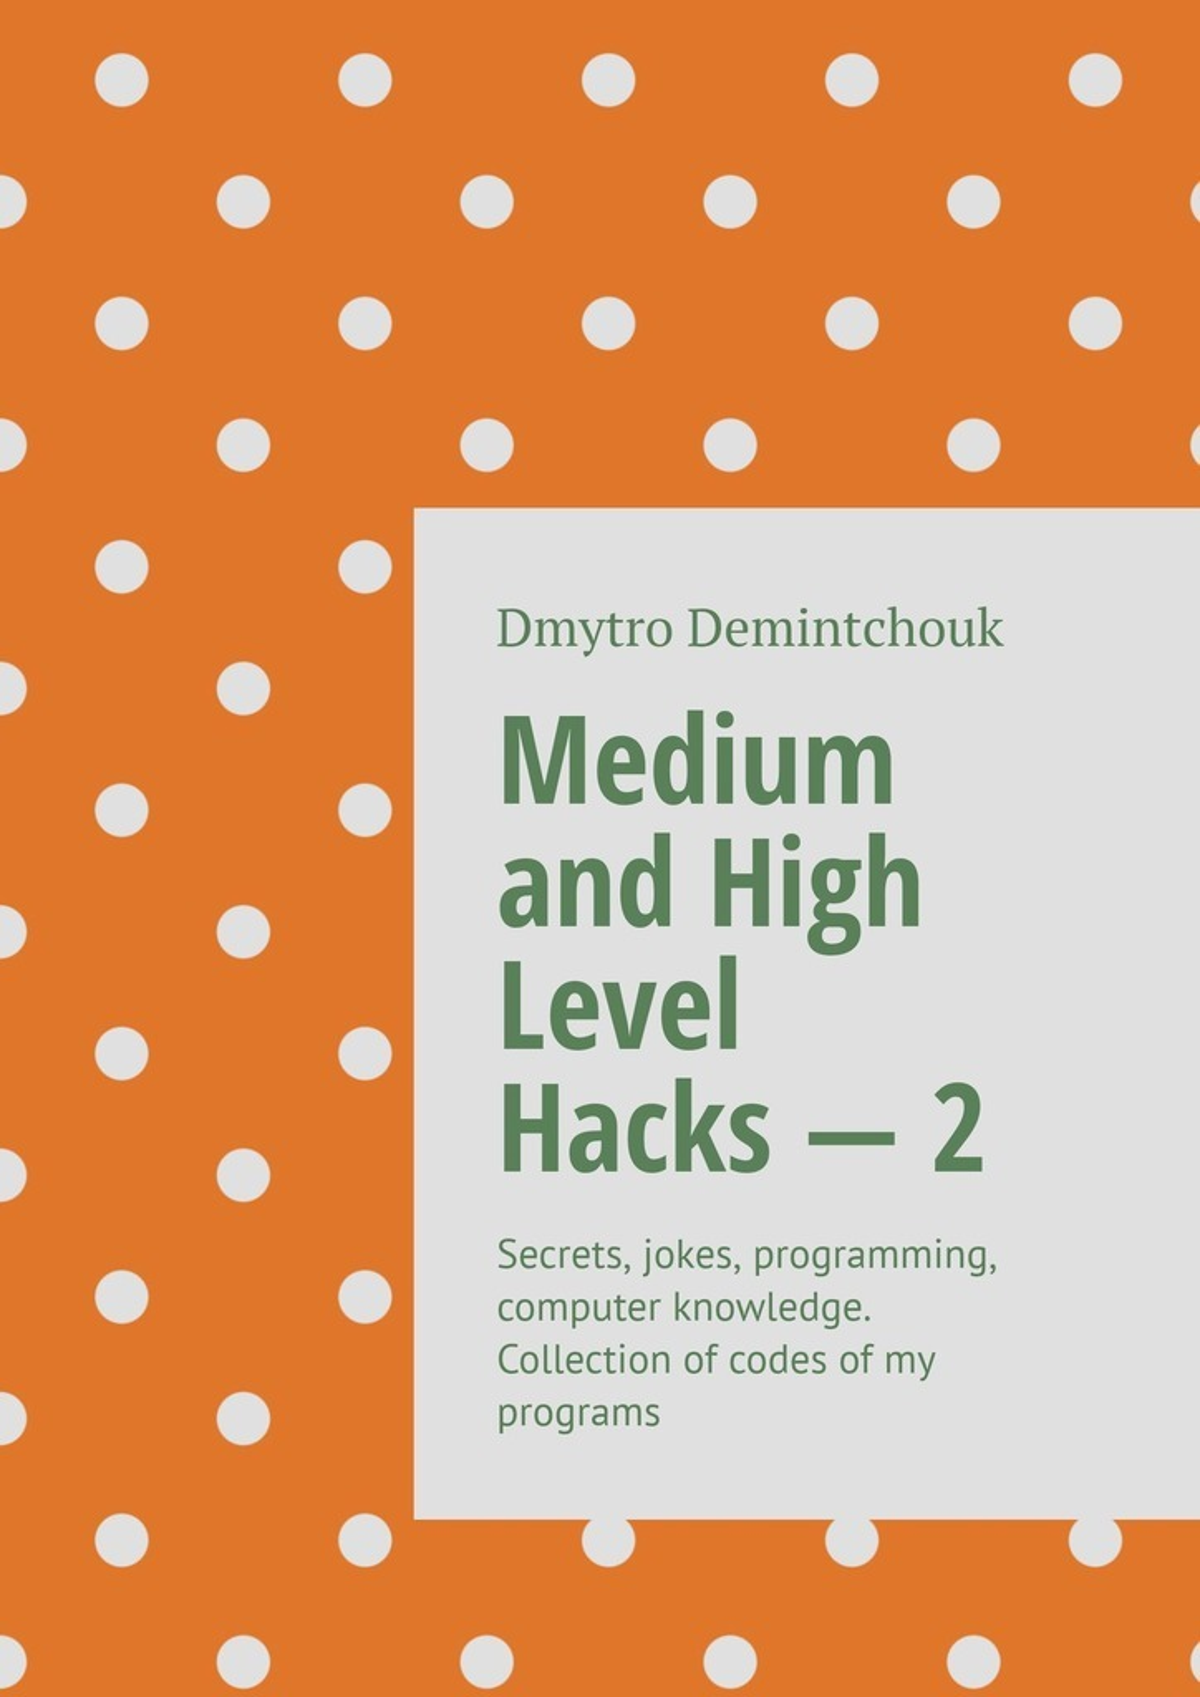 лучшая цена Dmytro Dmytrovy Demintchouk Medium and High Level Hacks–2. Secrets, jokes, programming, computer knowledge. Collection ofcodes ofmy programs